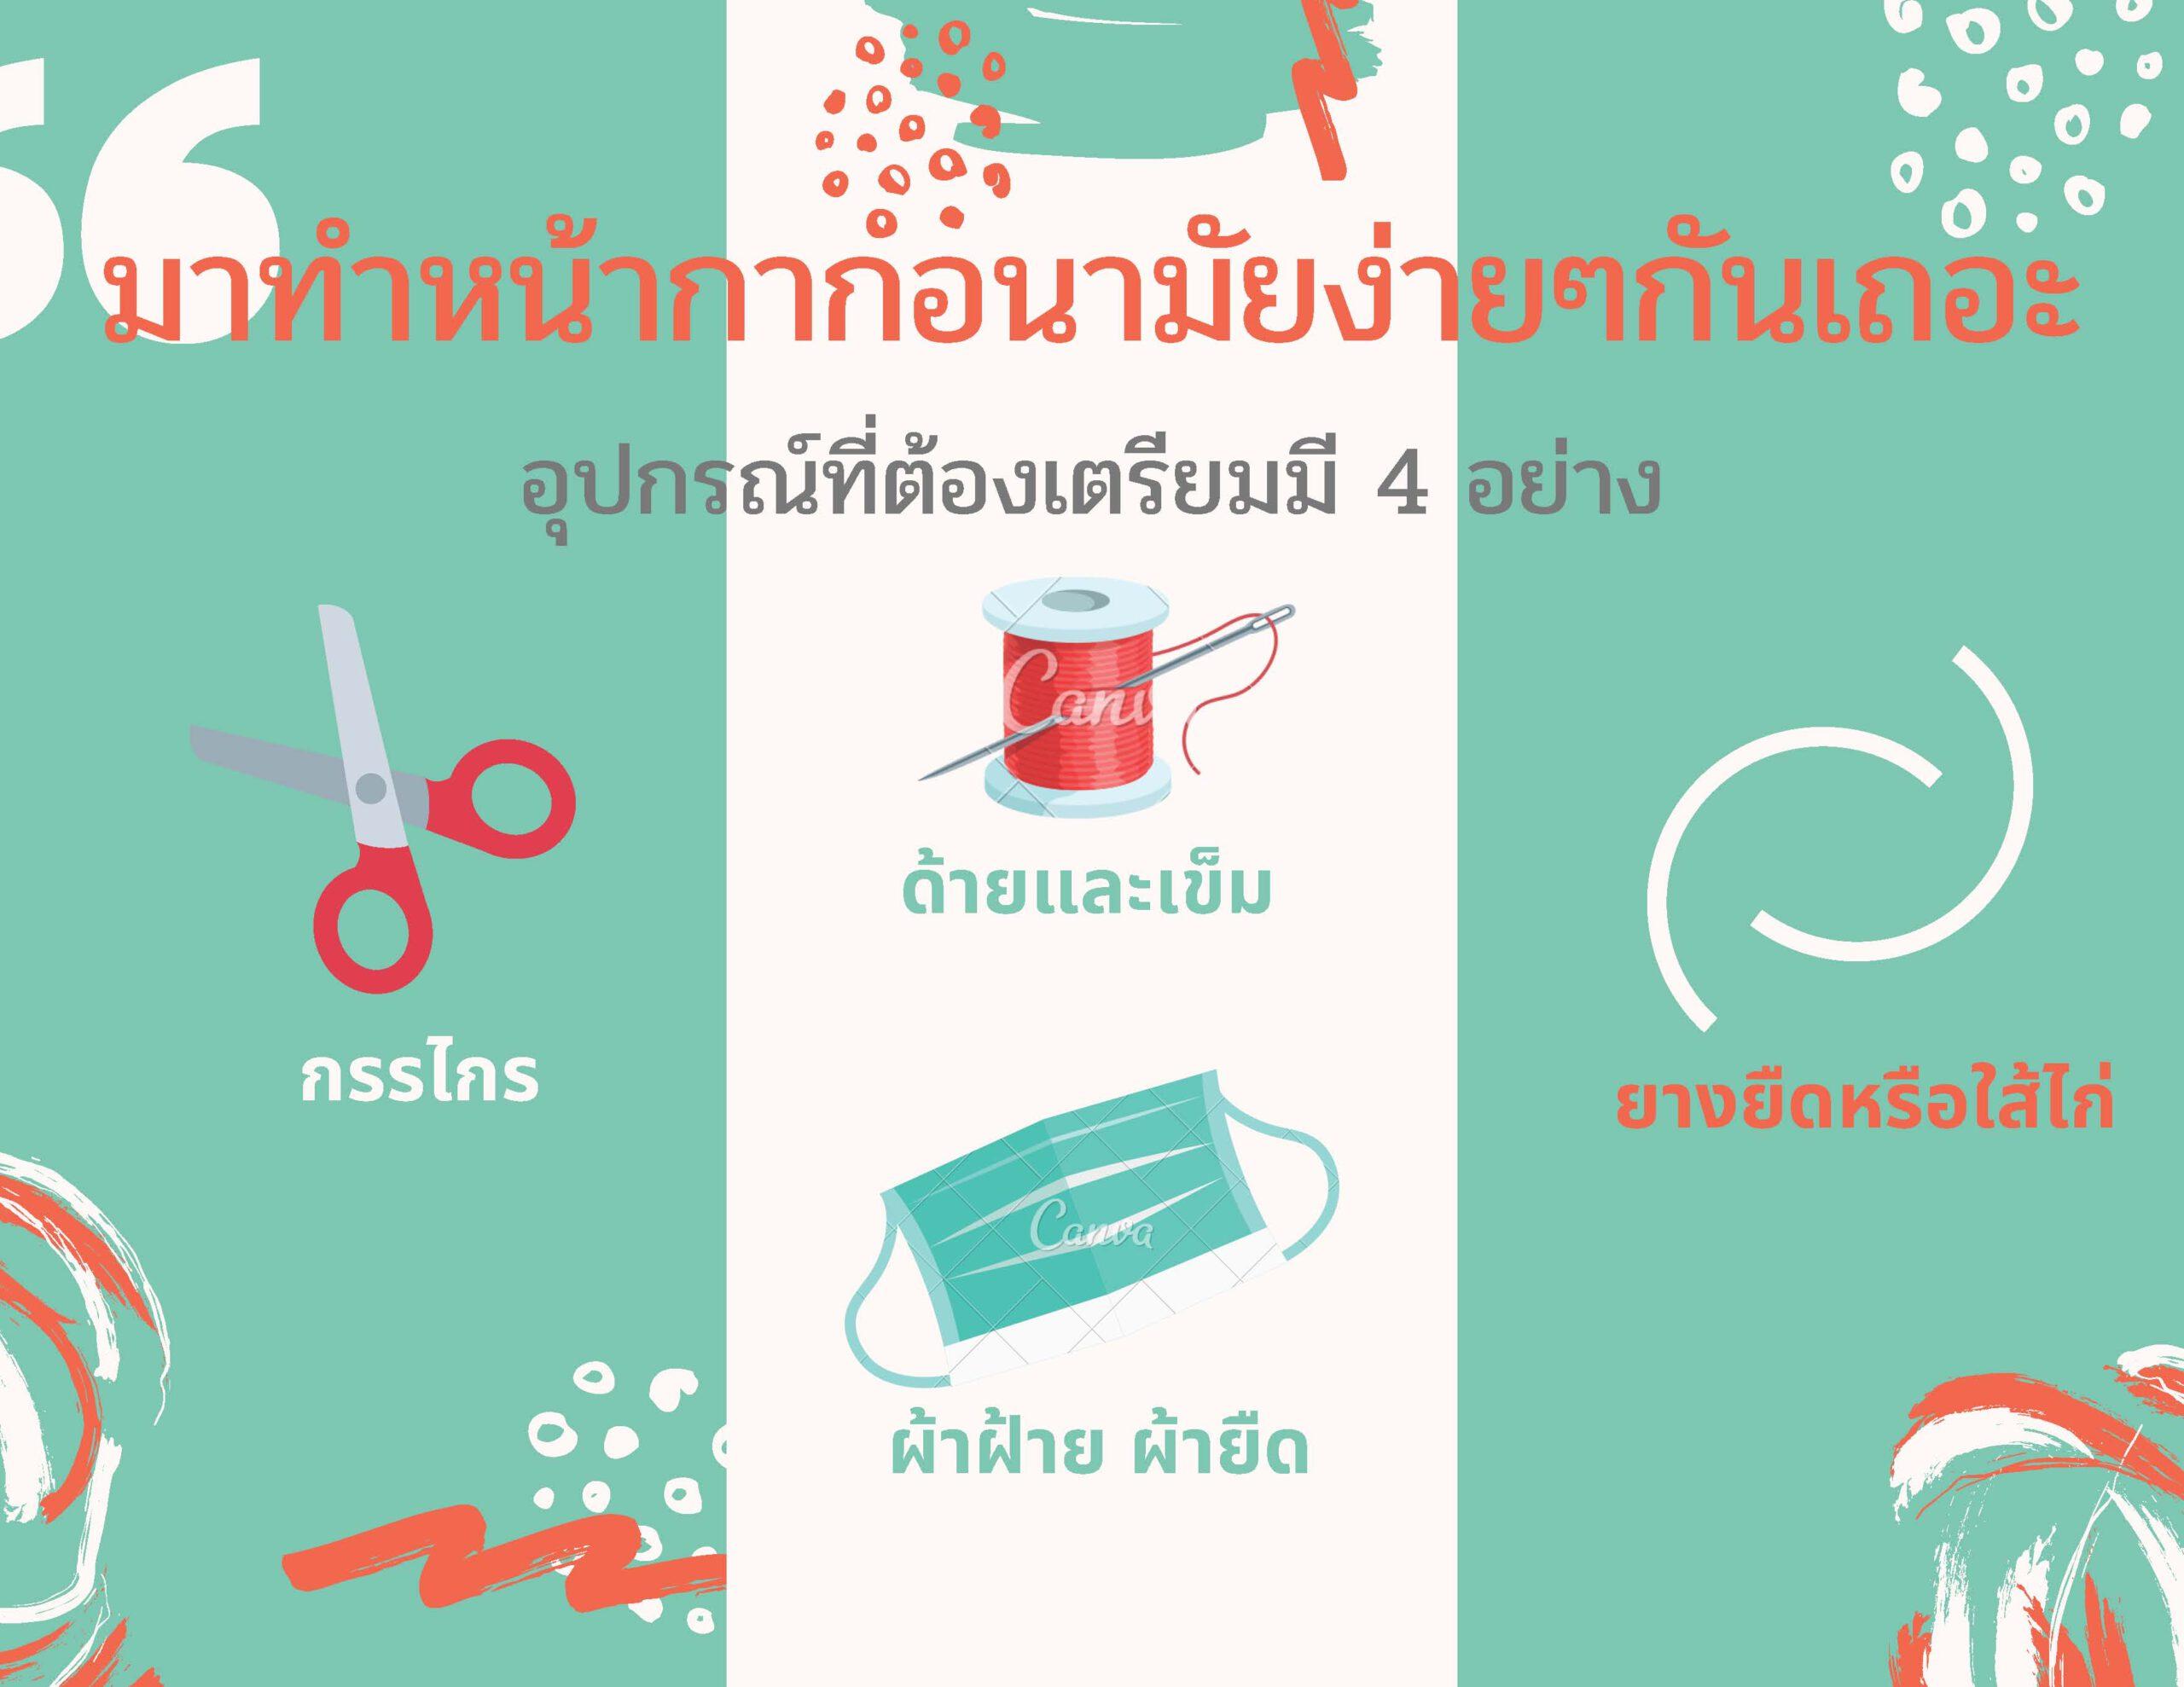 hygienic mask covid19